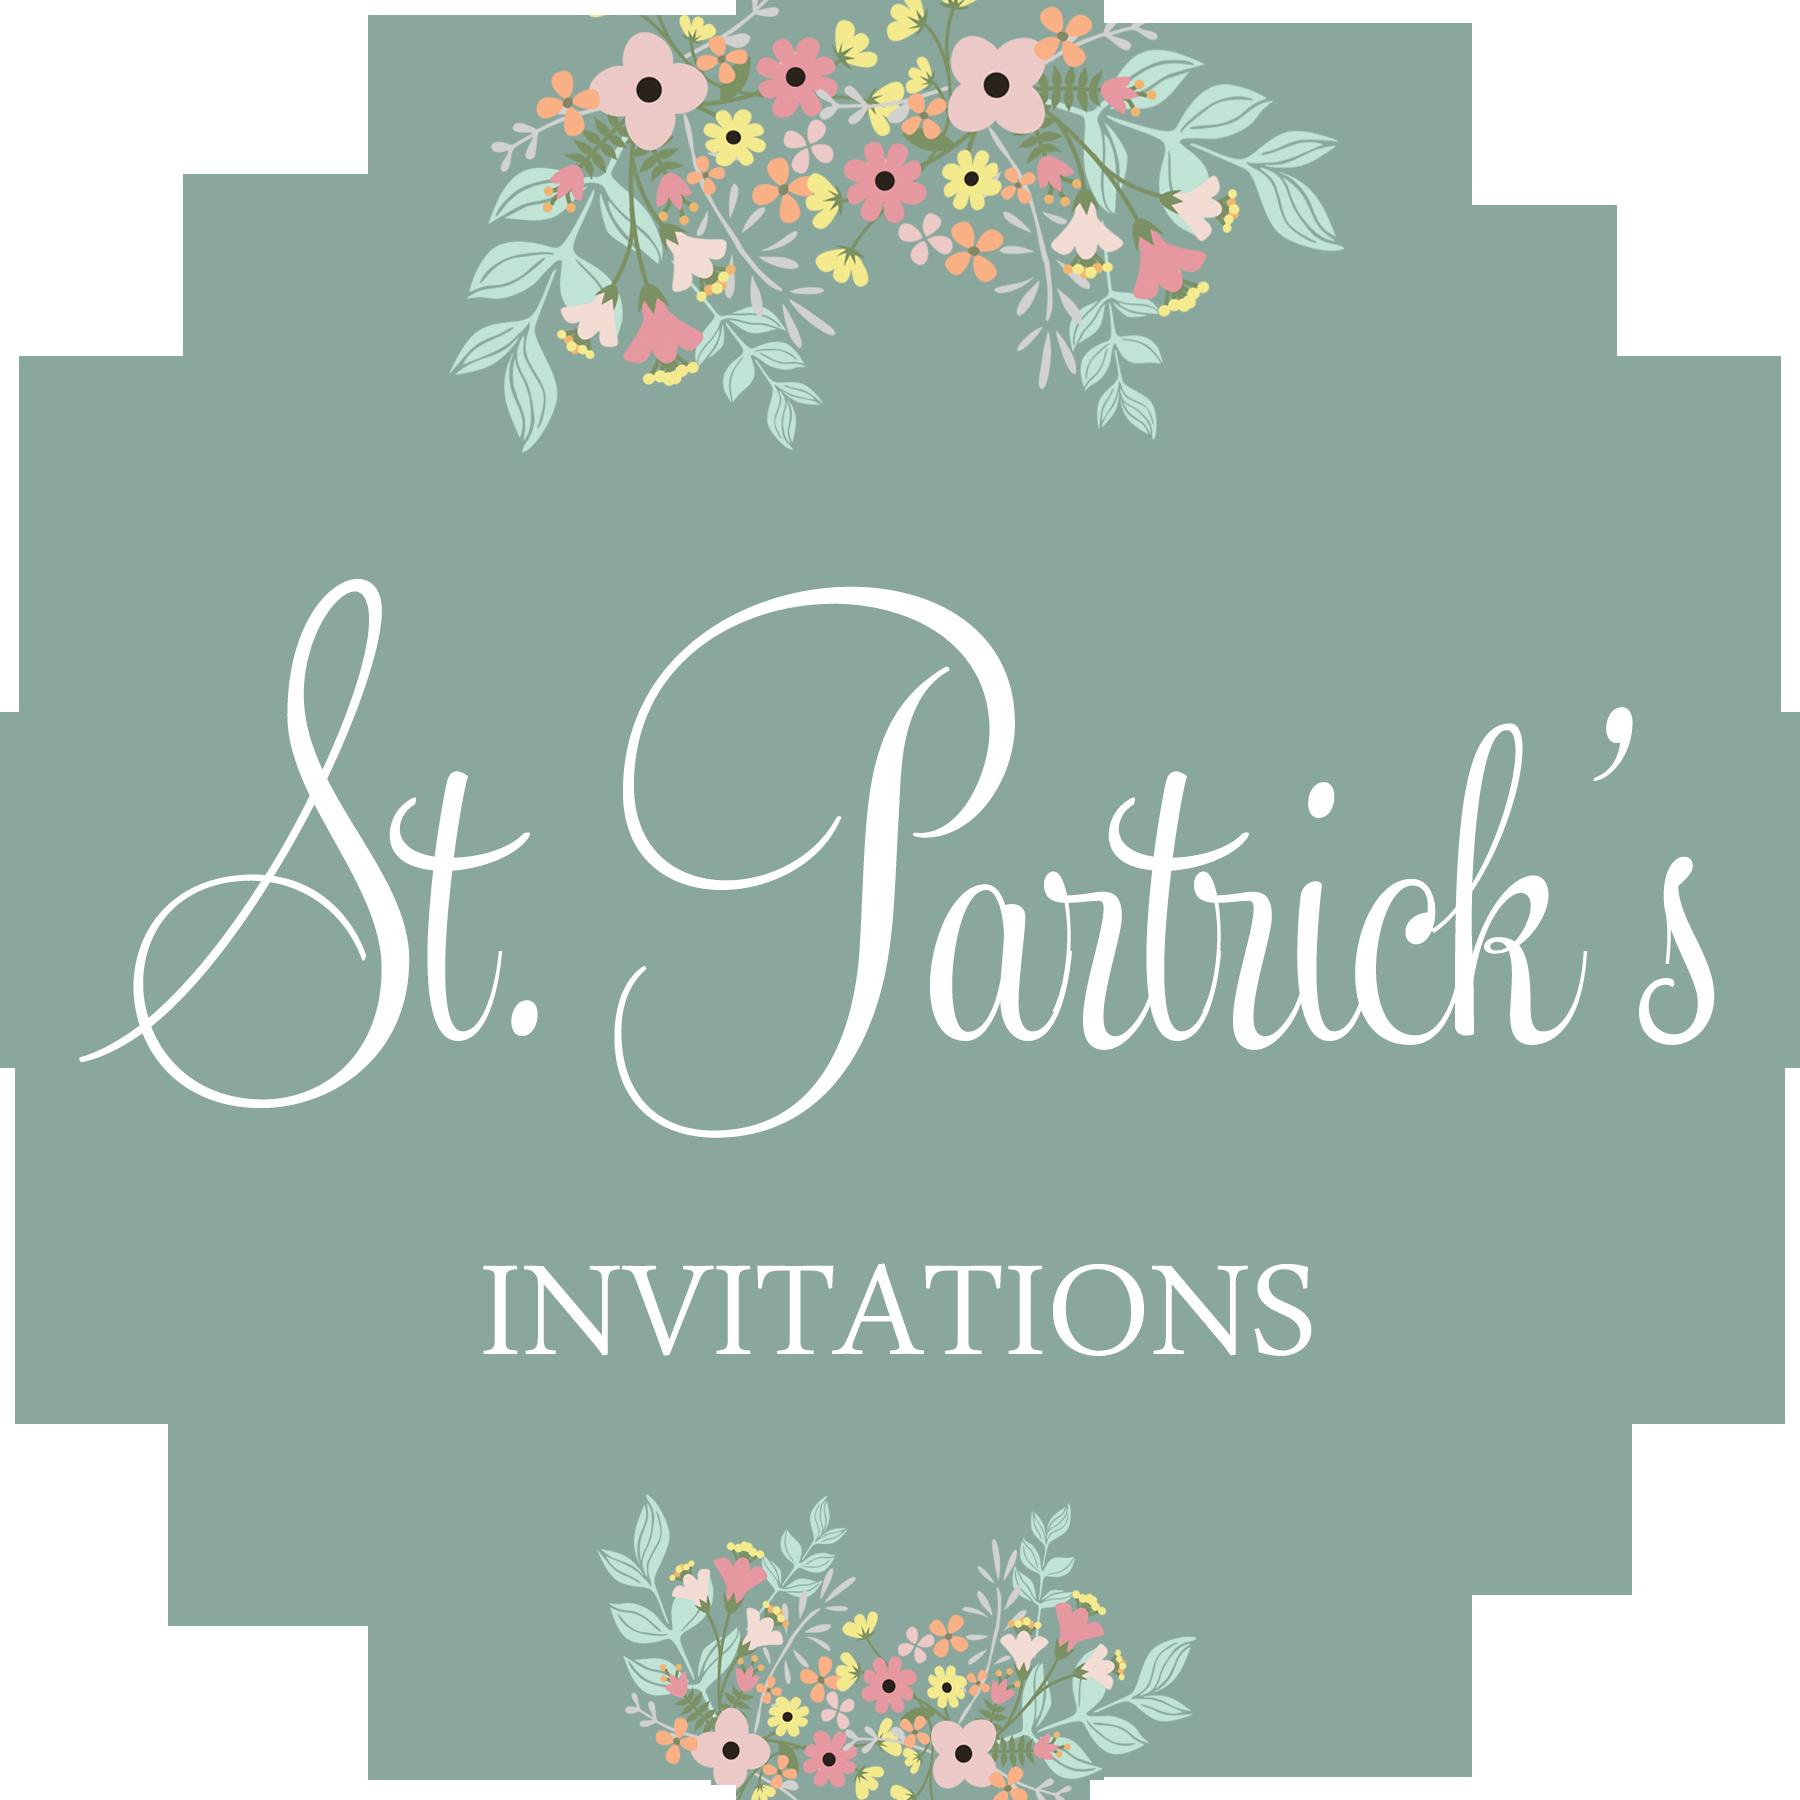 St. Partricks